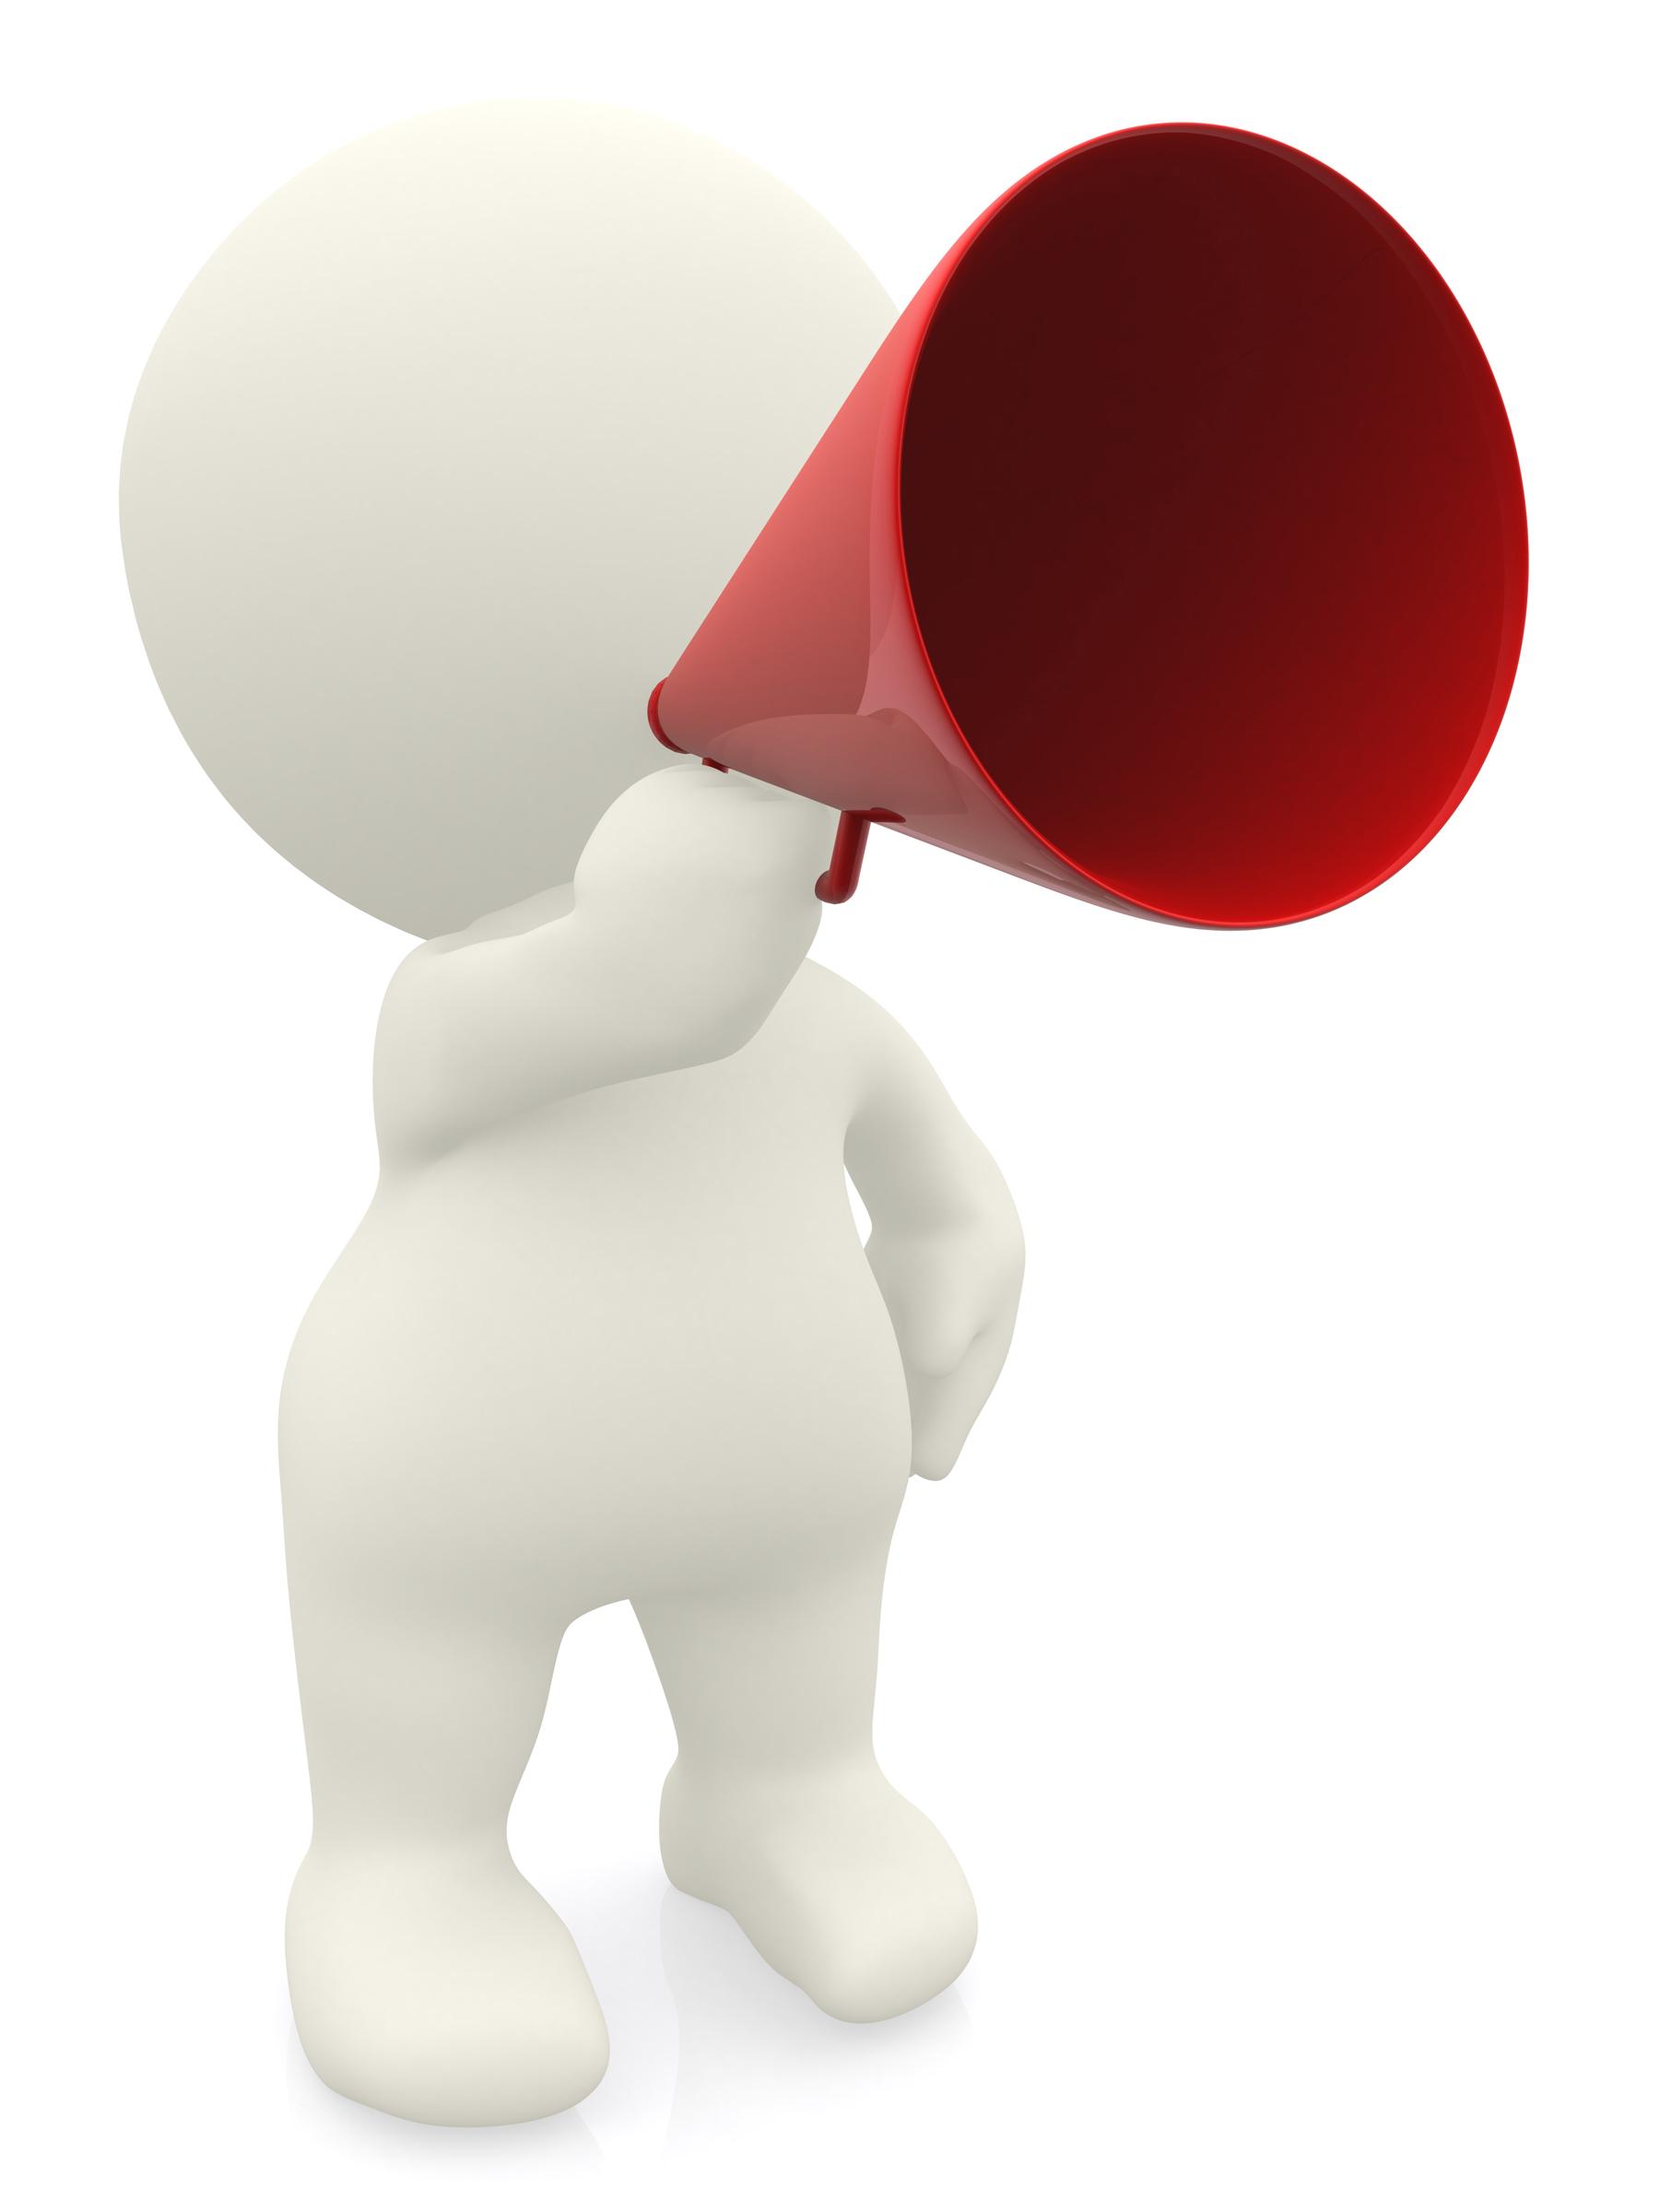 clip art black and white Announcement free download best. Announcements clipart megaphone